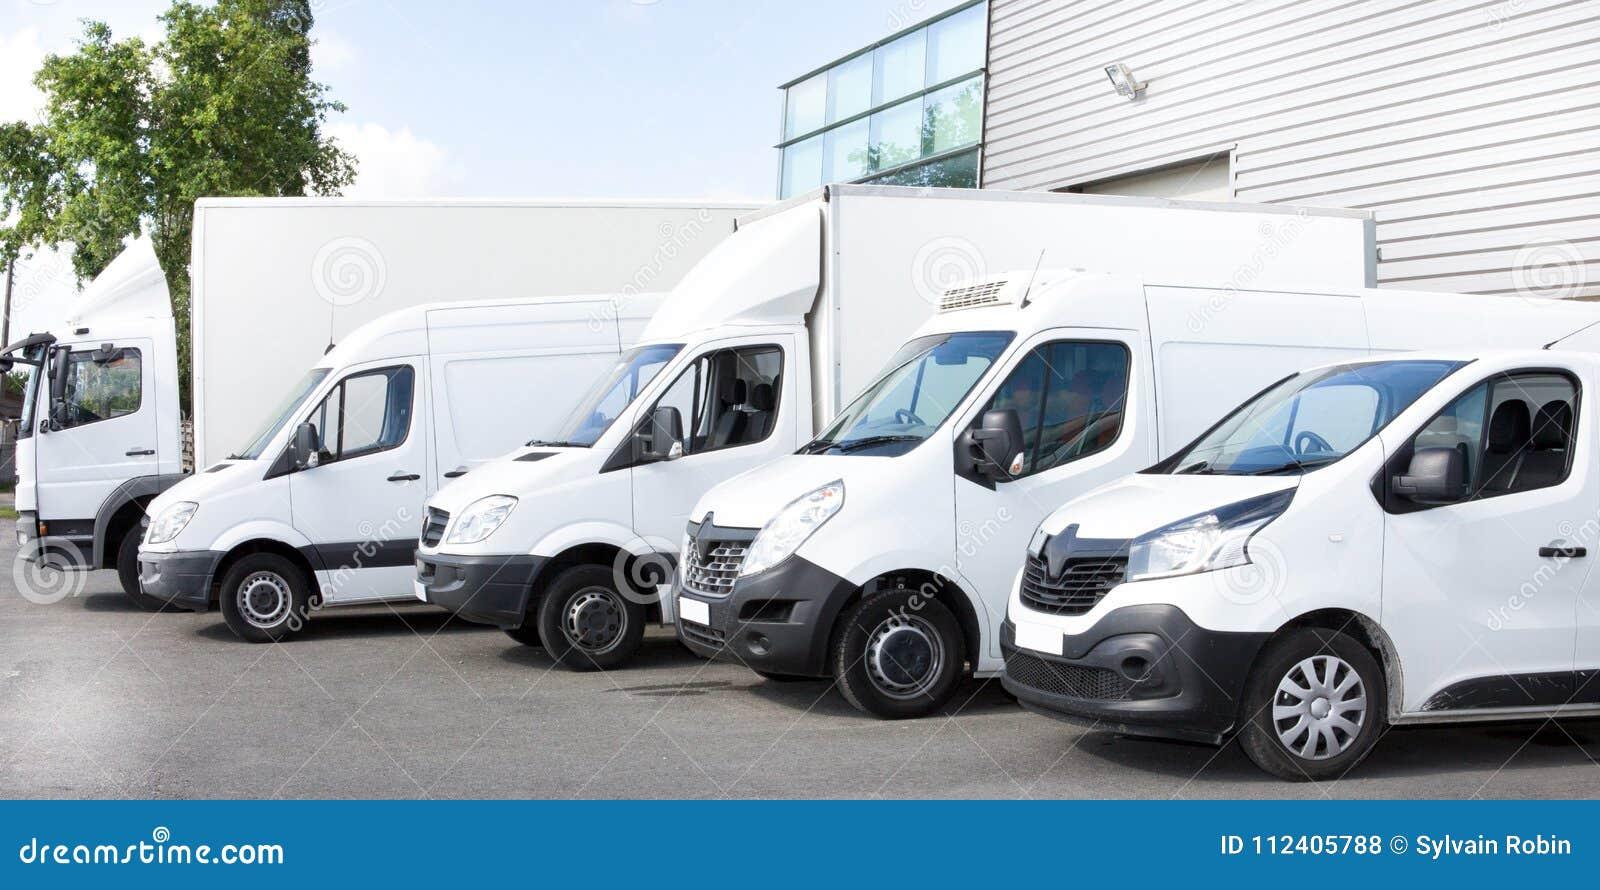 Several cars vans trucks parked in parking lot for rent